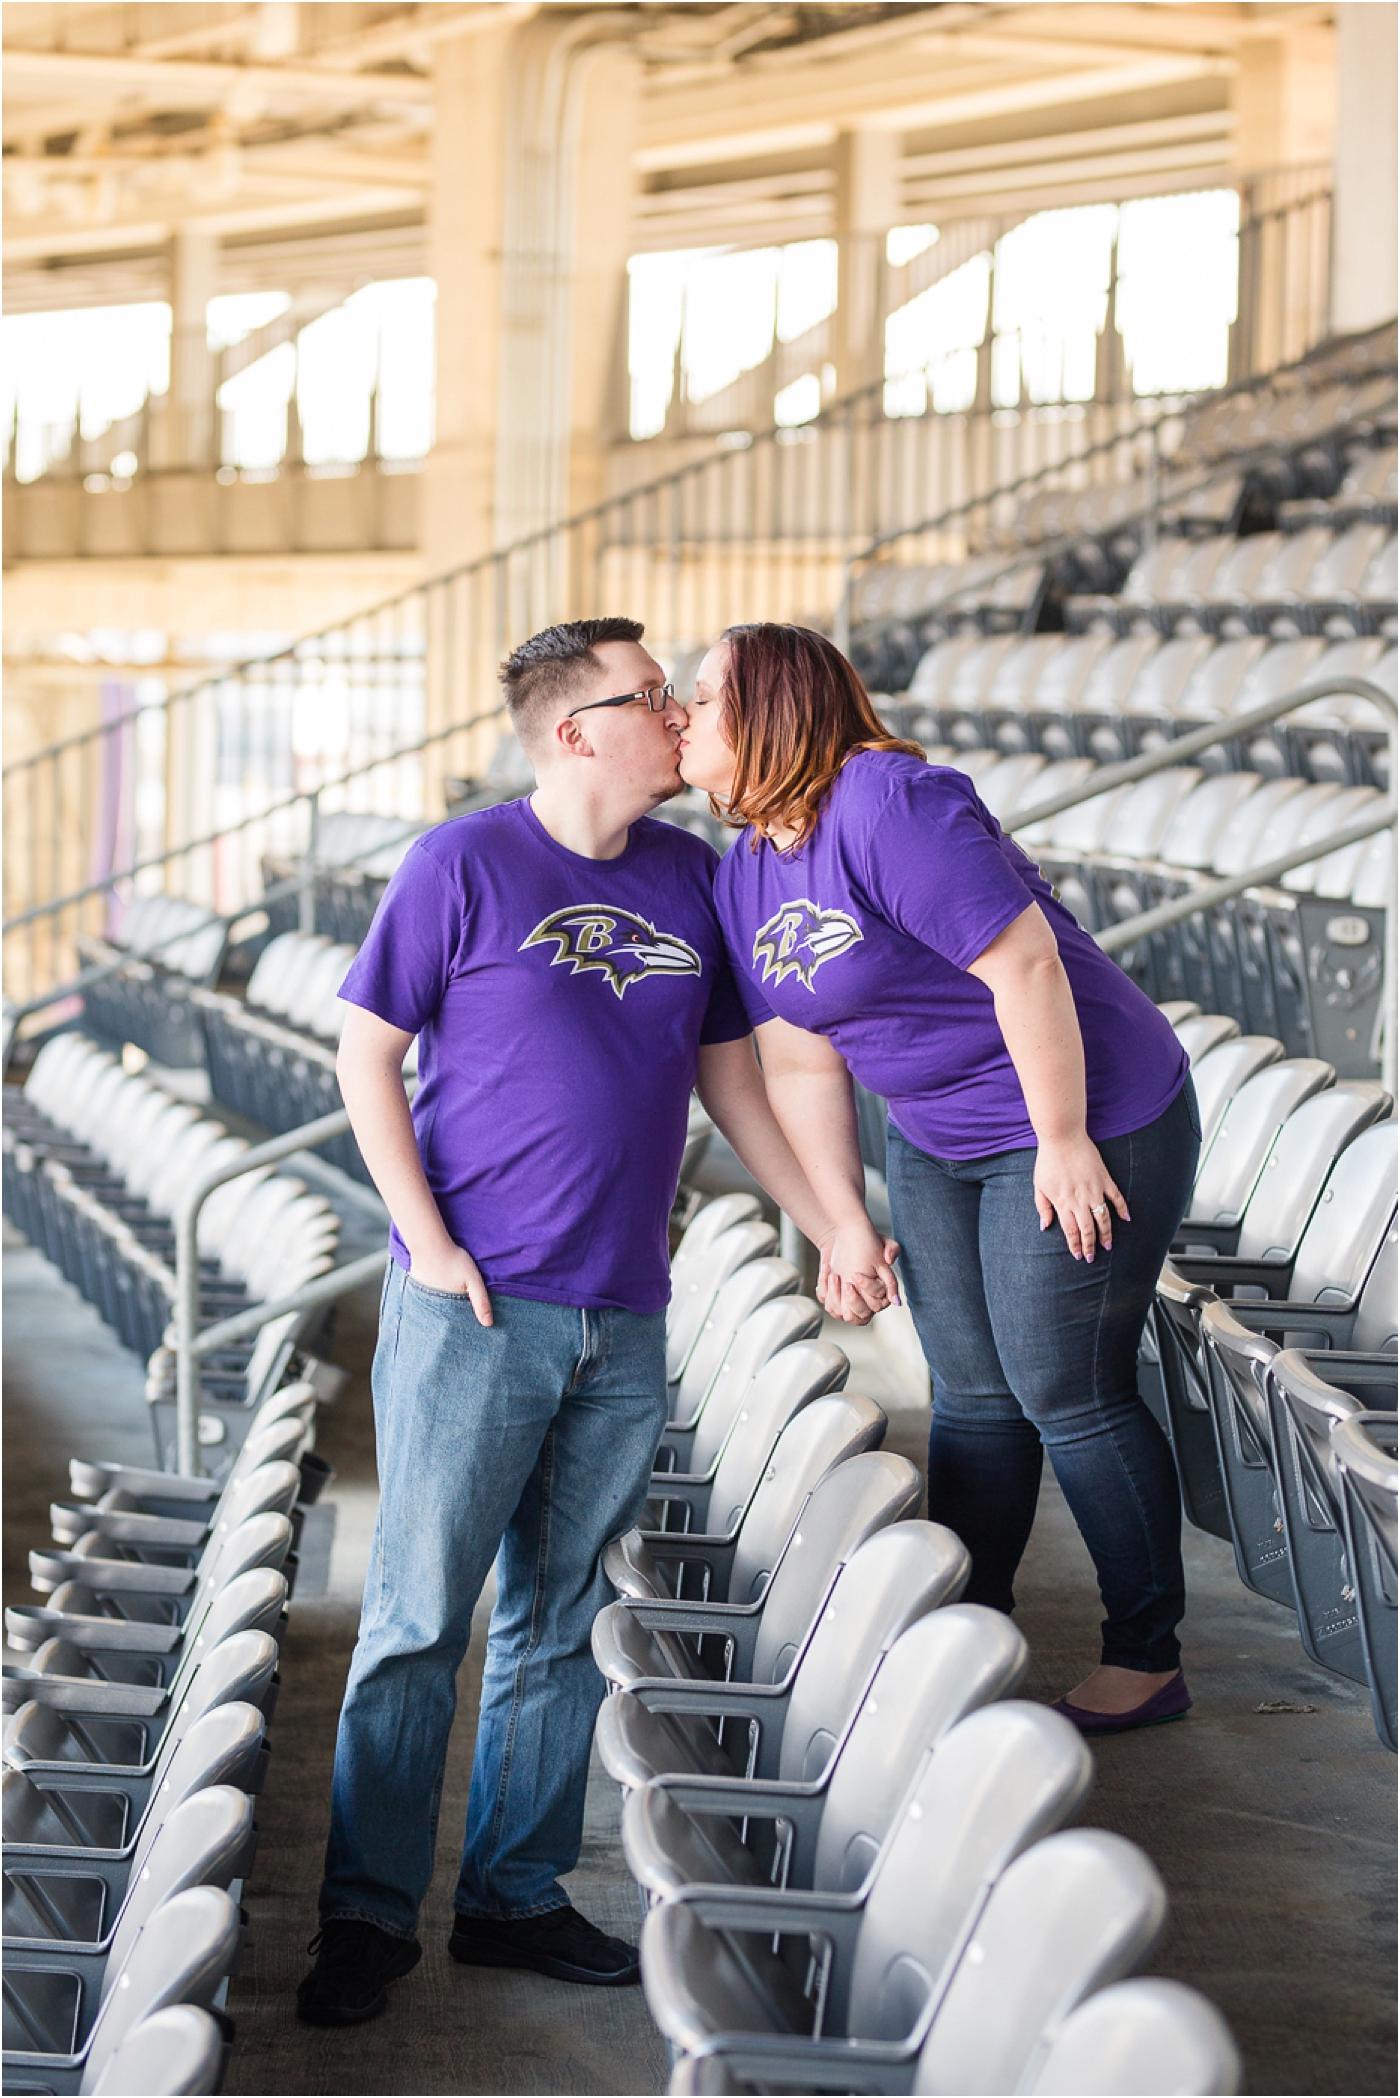 Ravens-Stadium-Engagement-Photos-17.jpg